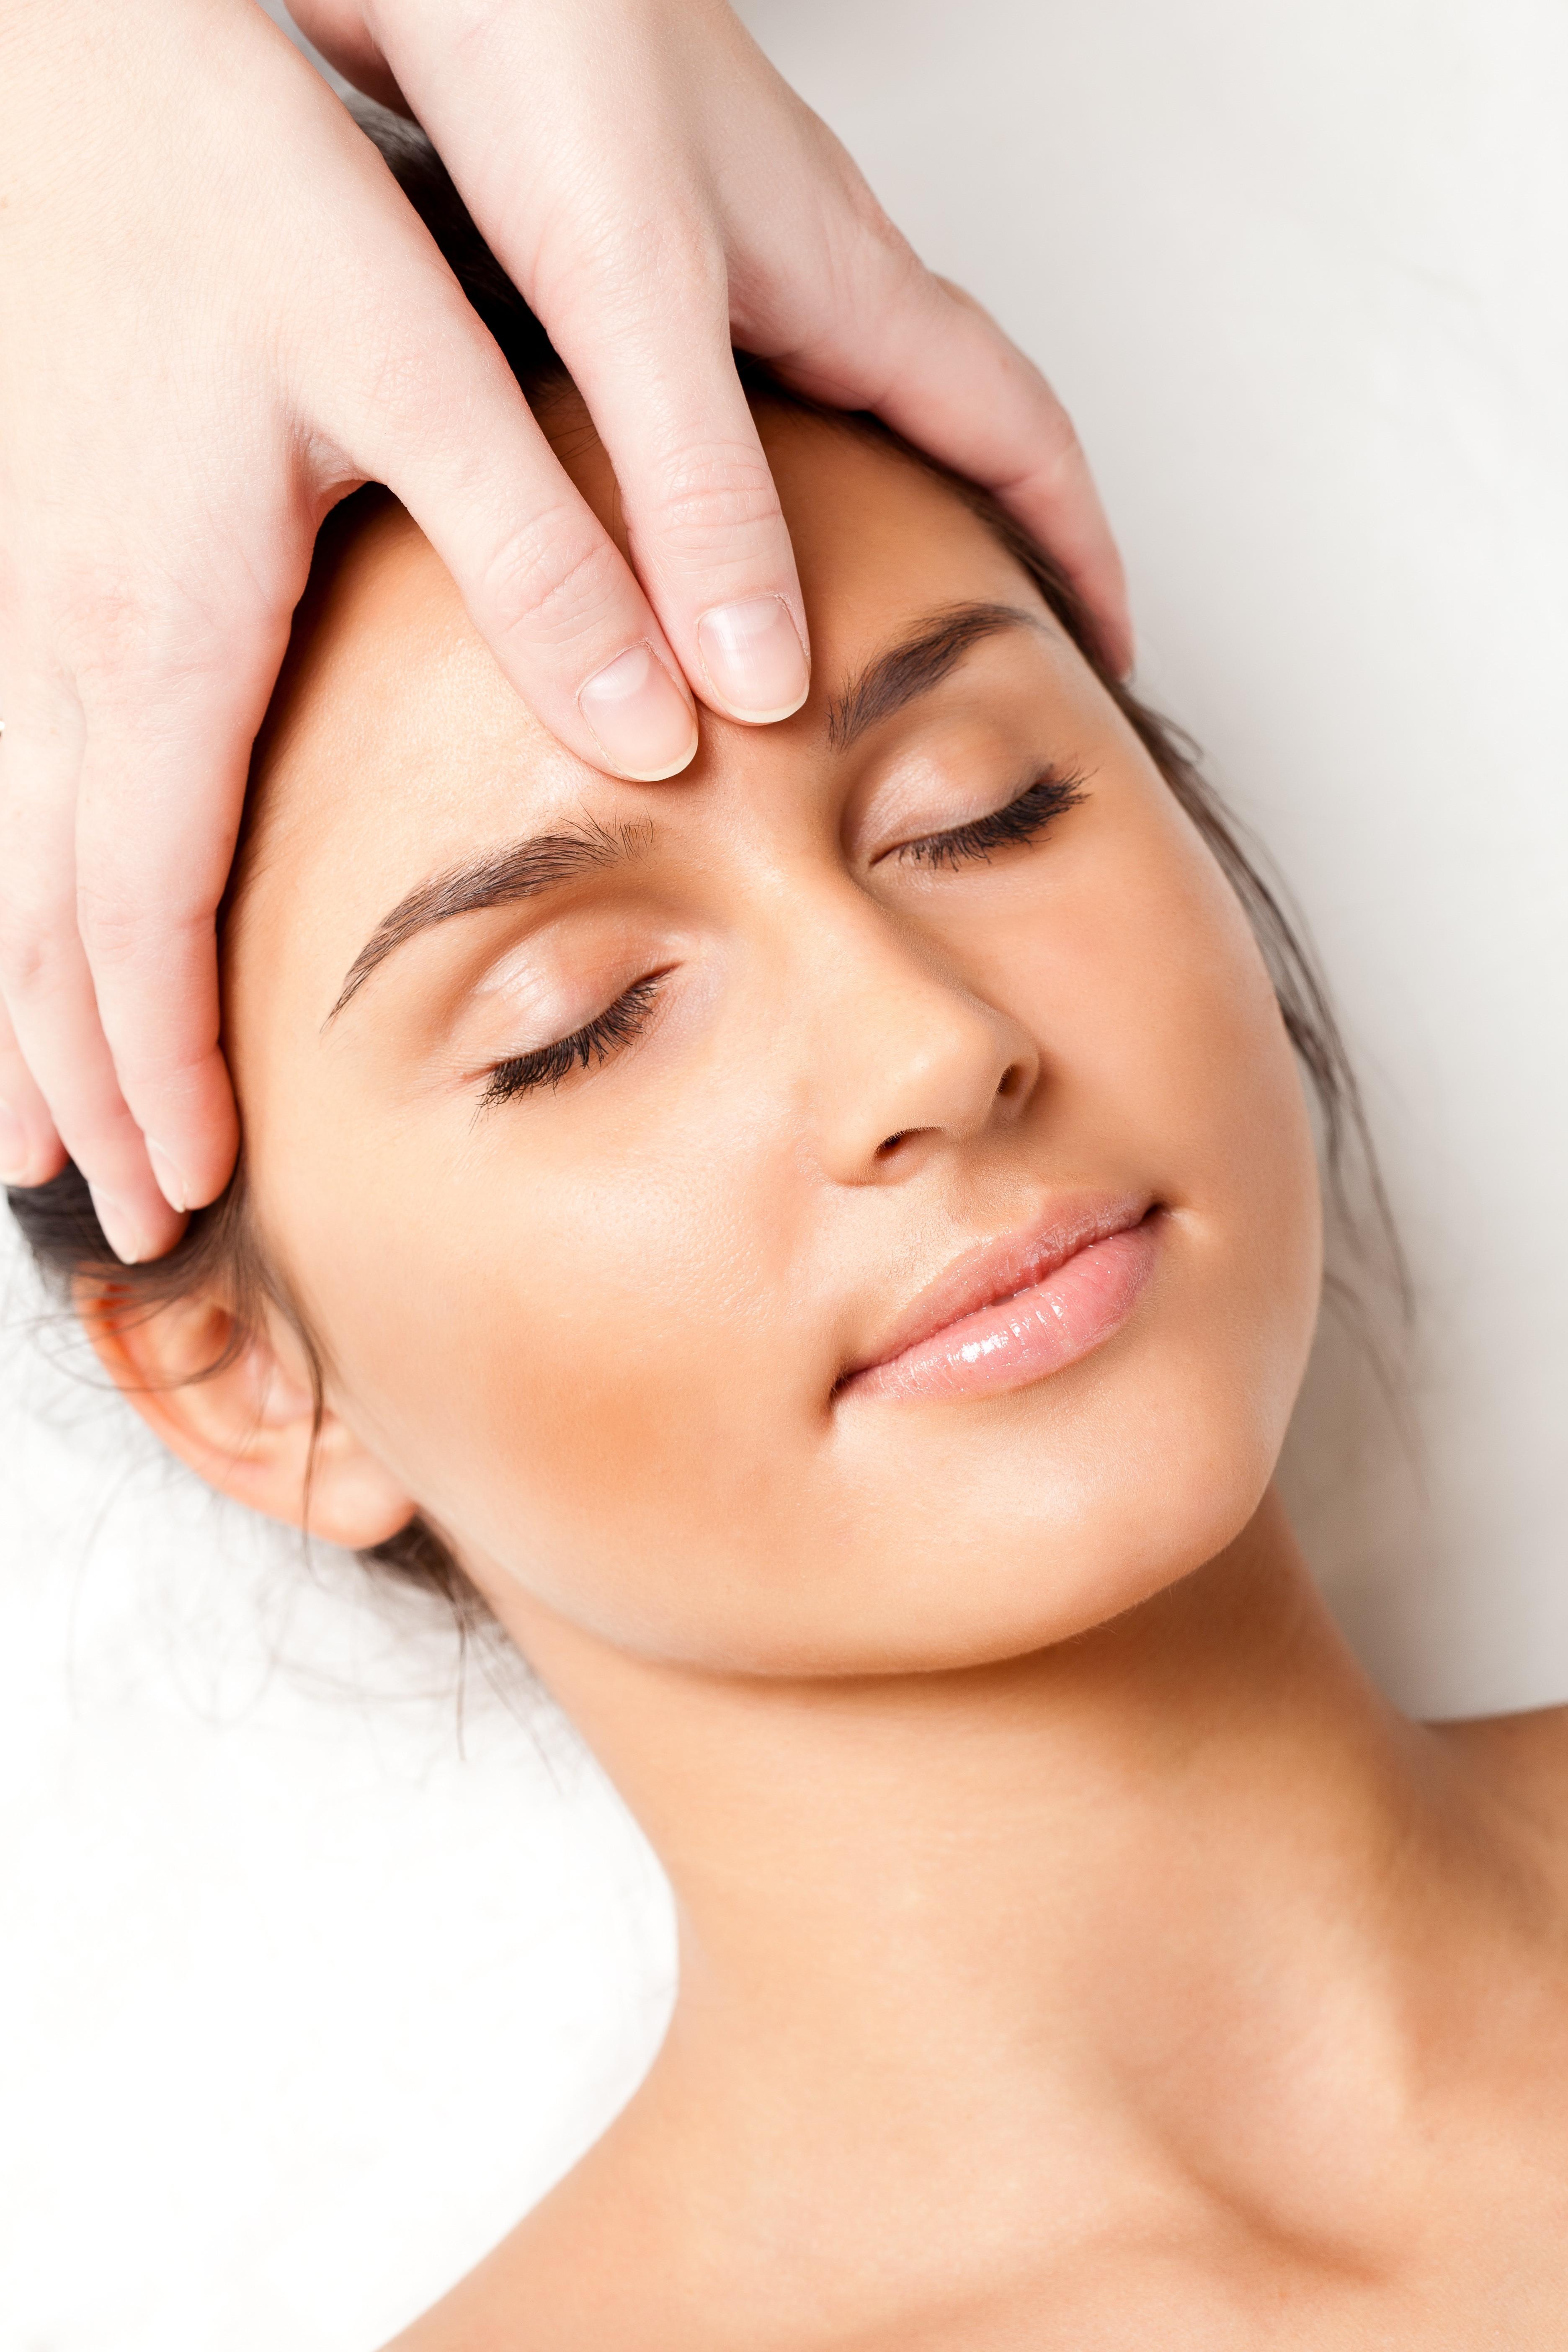 Indian Head Massage session